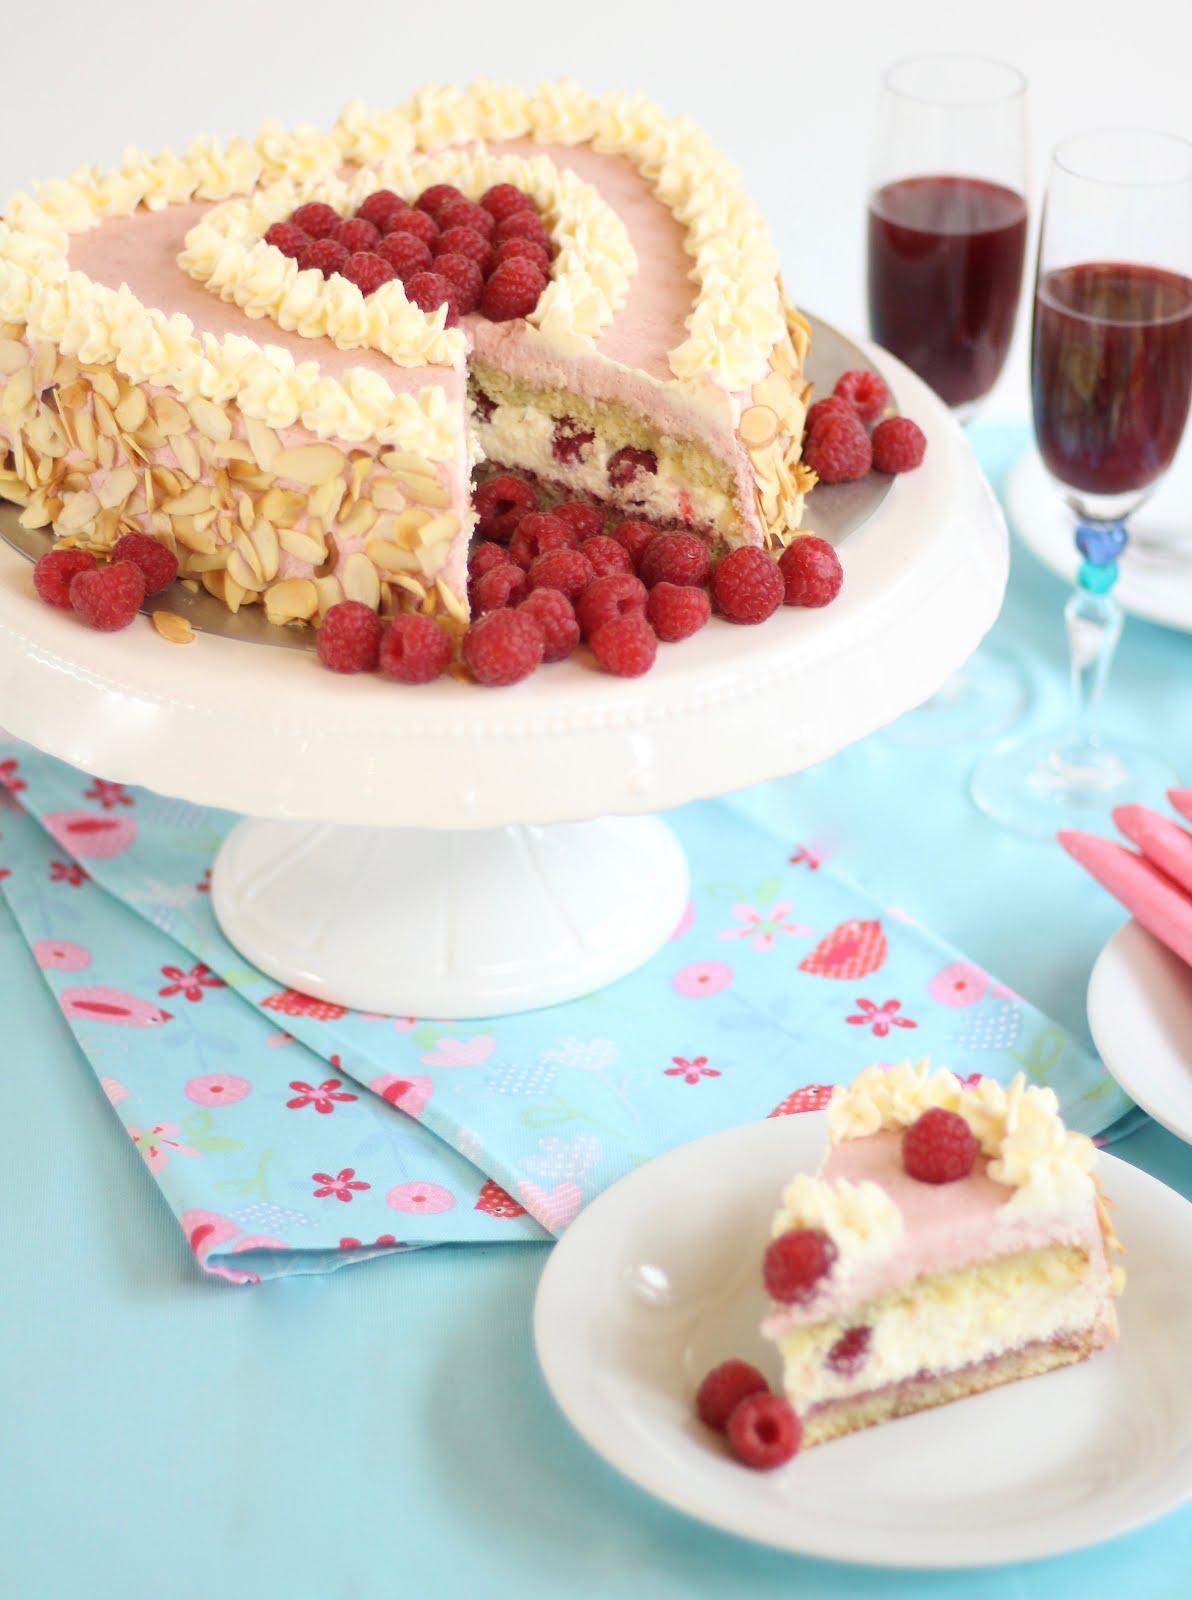 Super Leckere Himbeer Sahne Torte In Herzform 10 000 Abonnenten